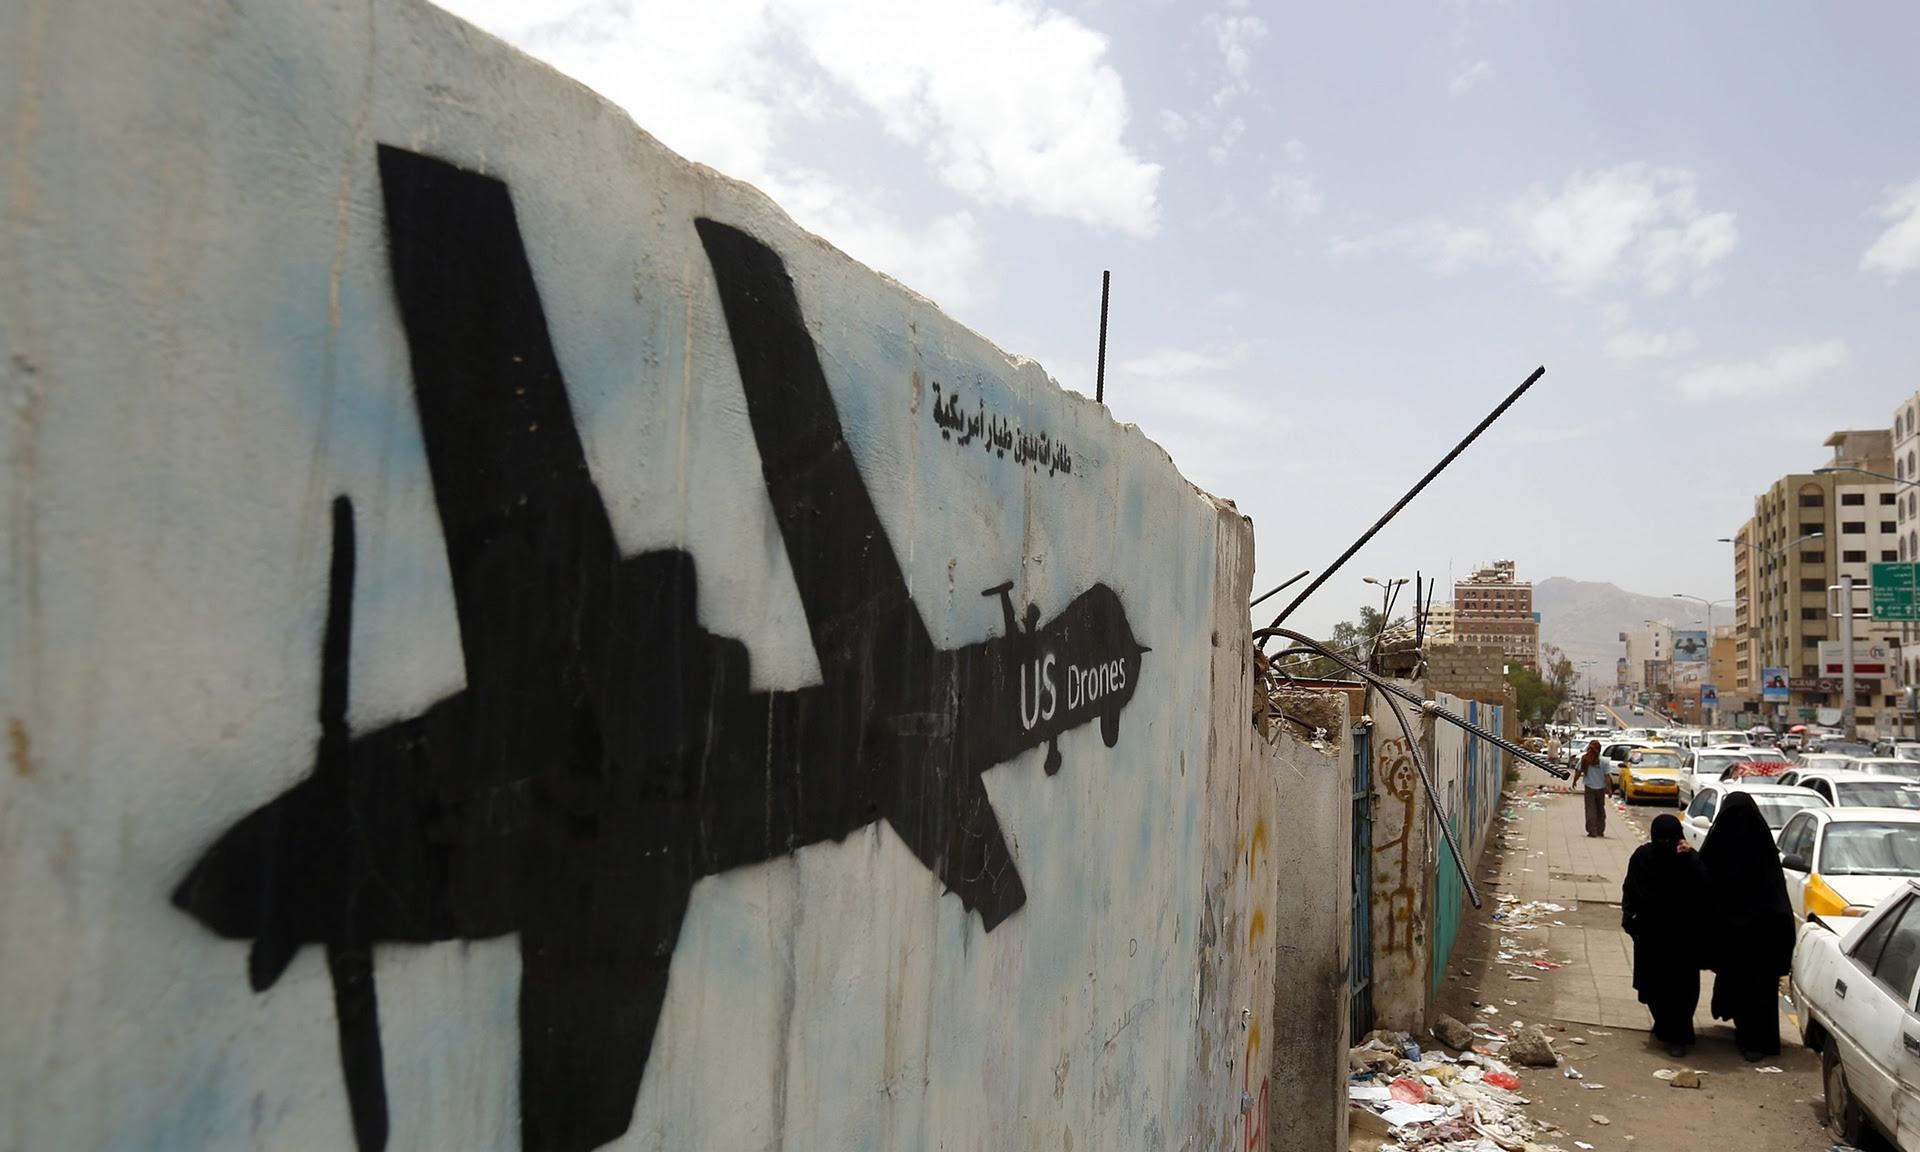 Yemenis walk past graffiti showing a US drone. Photograph: Yahya Arhab/EPA